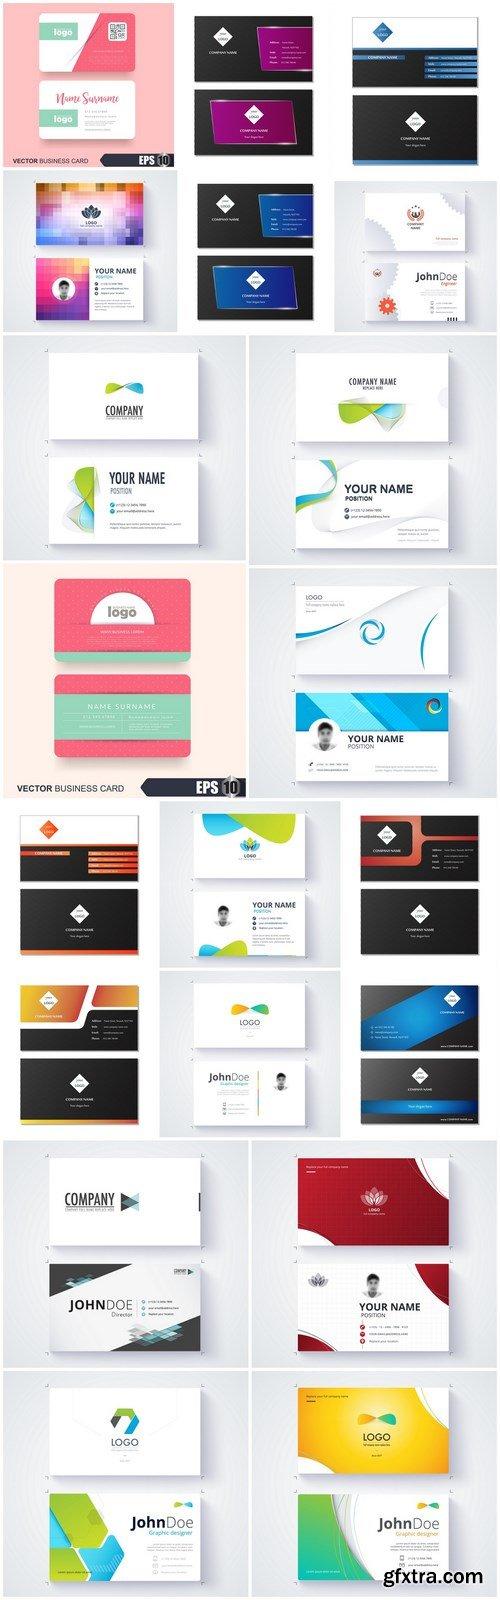 Business Card Design #145 - 20 Vector